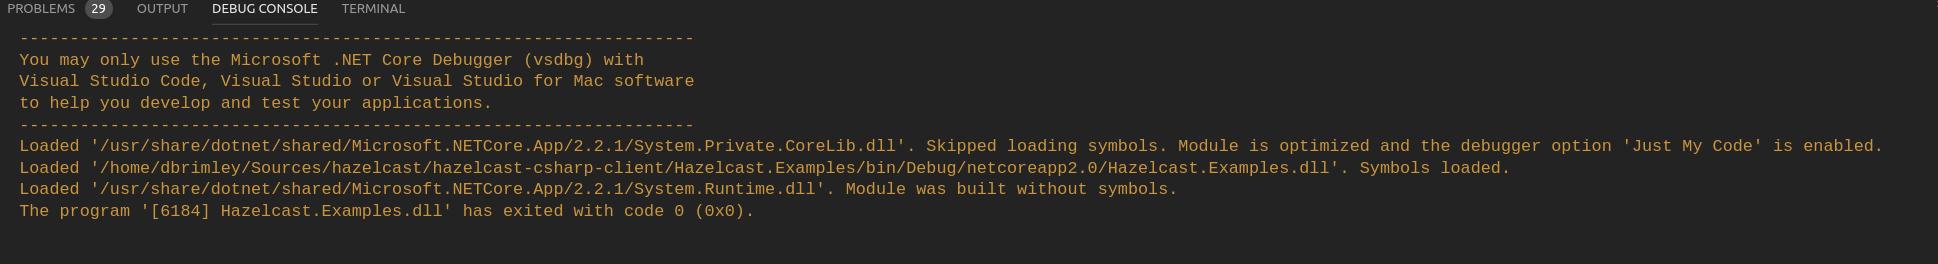 Ubuntu Debug Issue : You may only use the Microsoft  NET